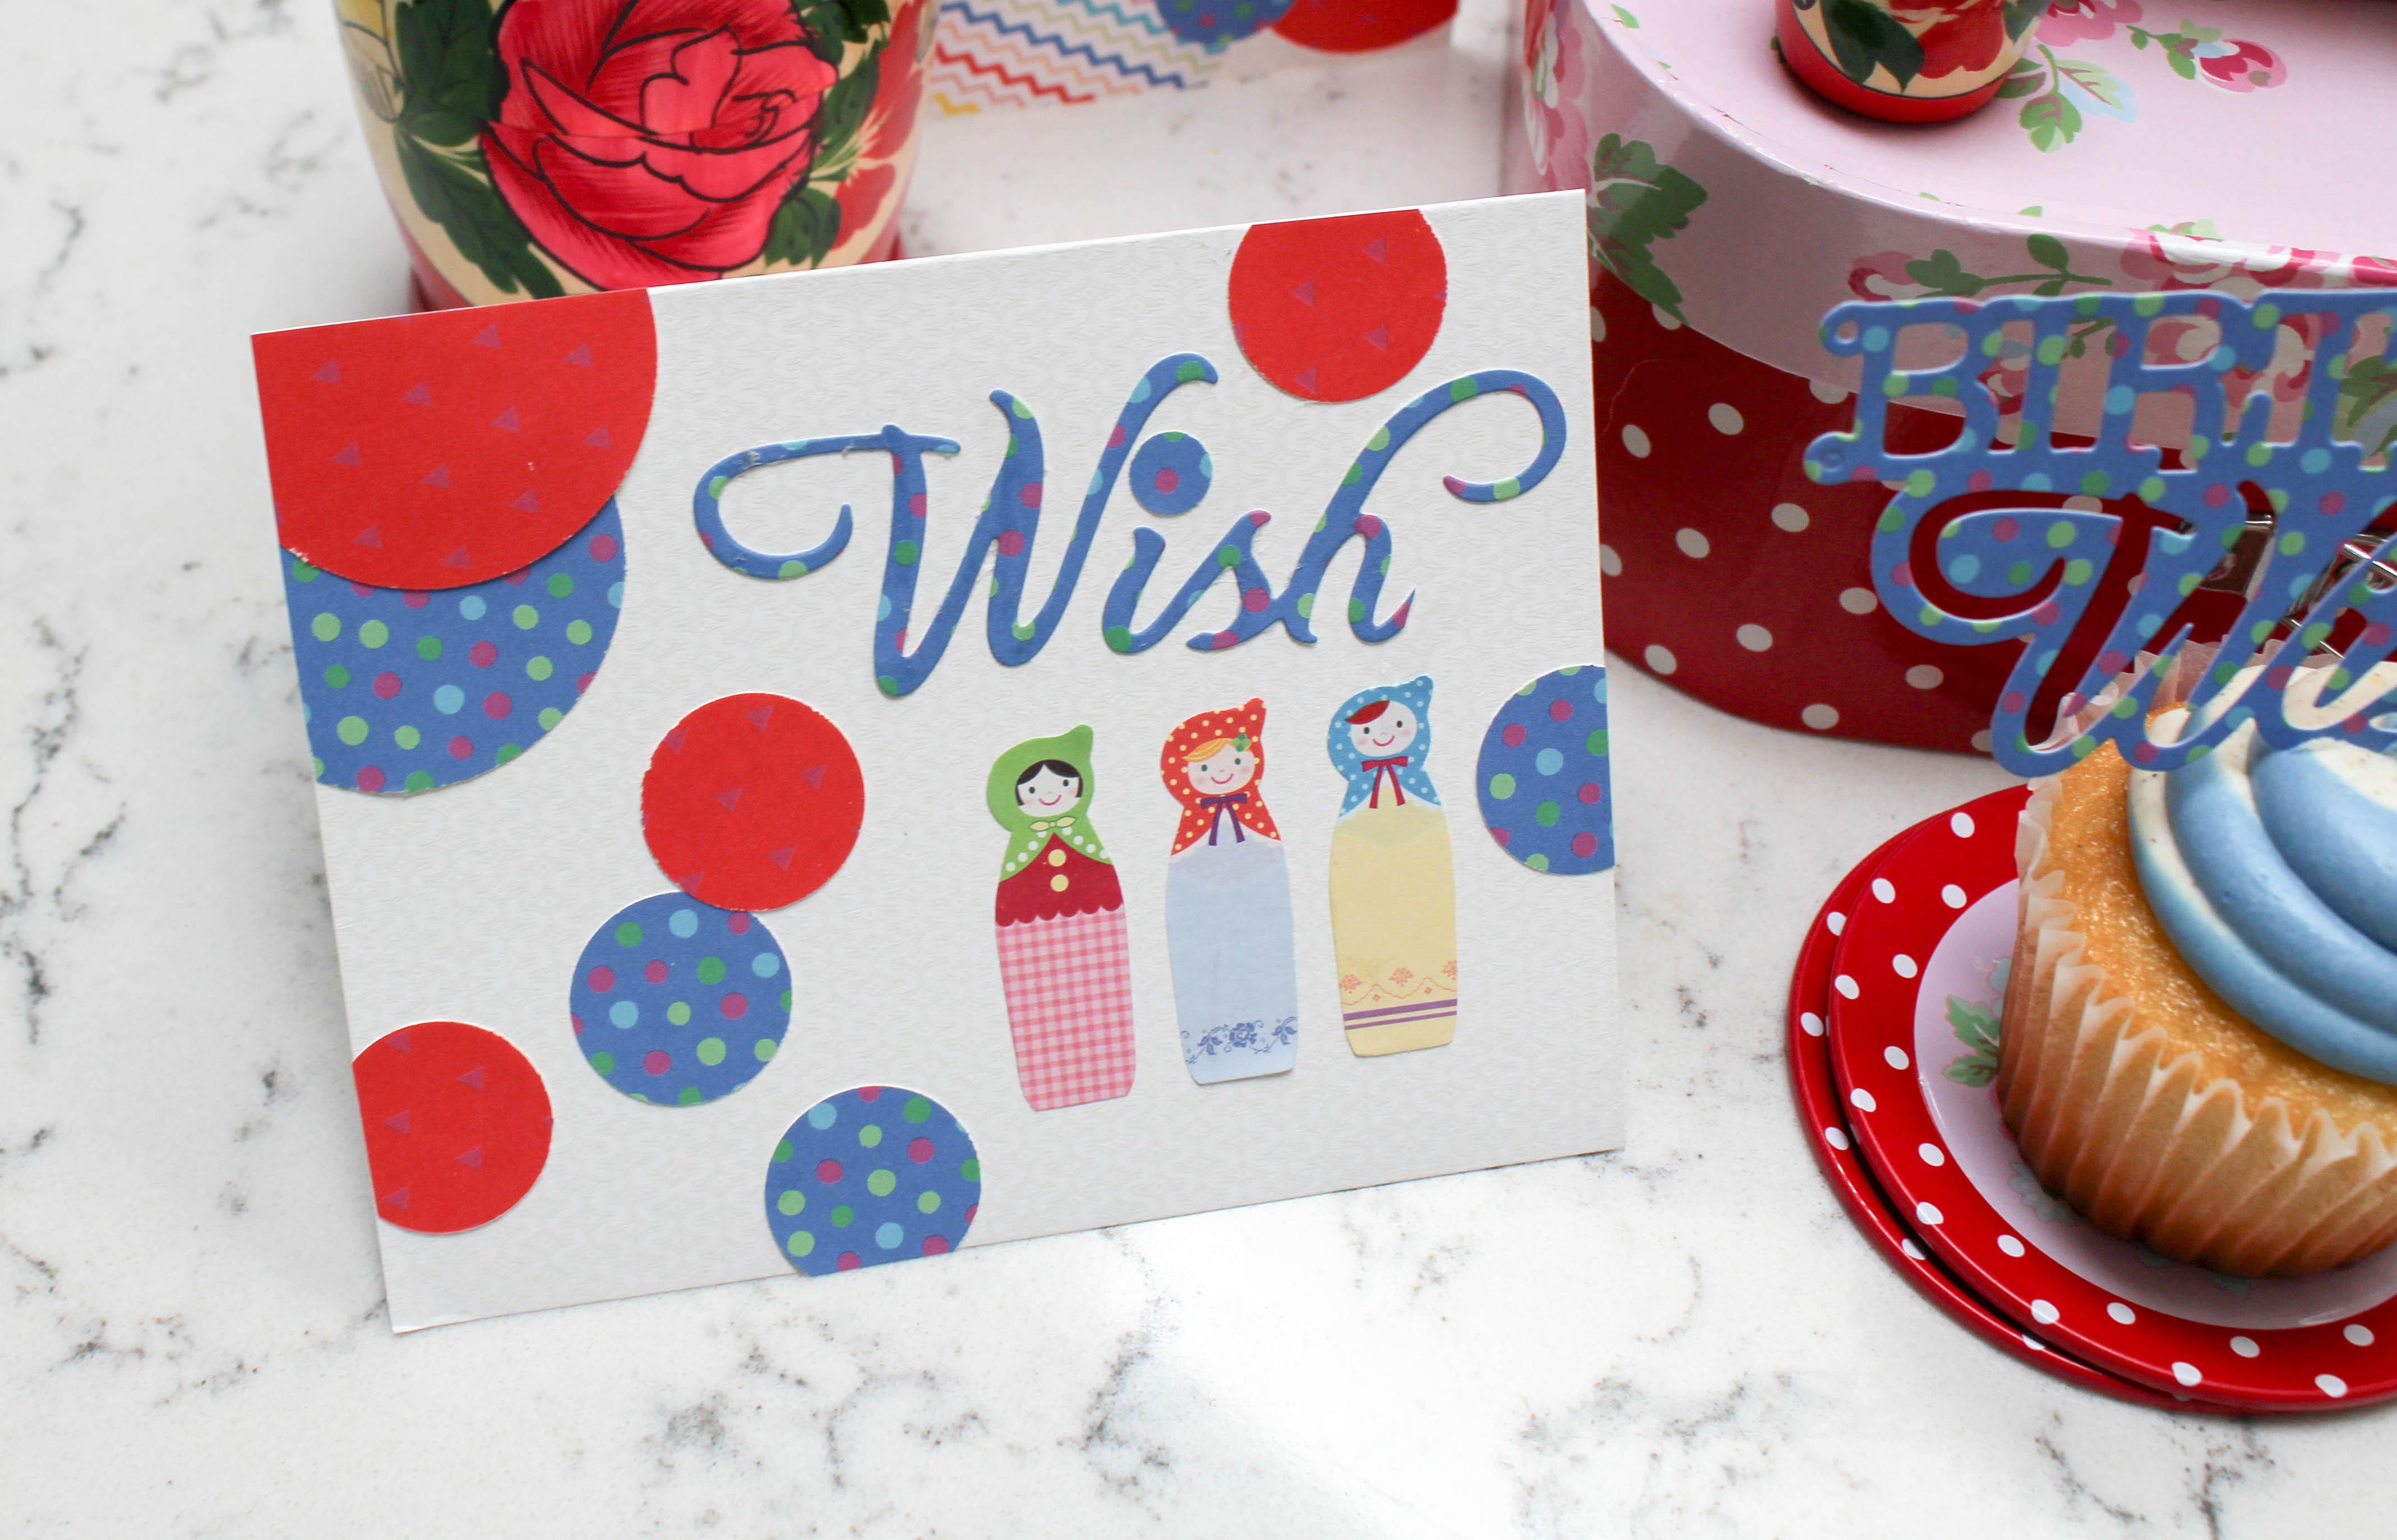 matroyshka nesting dolls where women cook sizzix dies birthday wishes cake topper-5